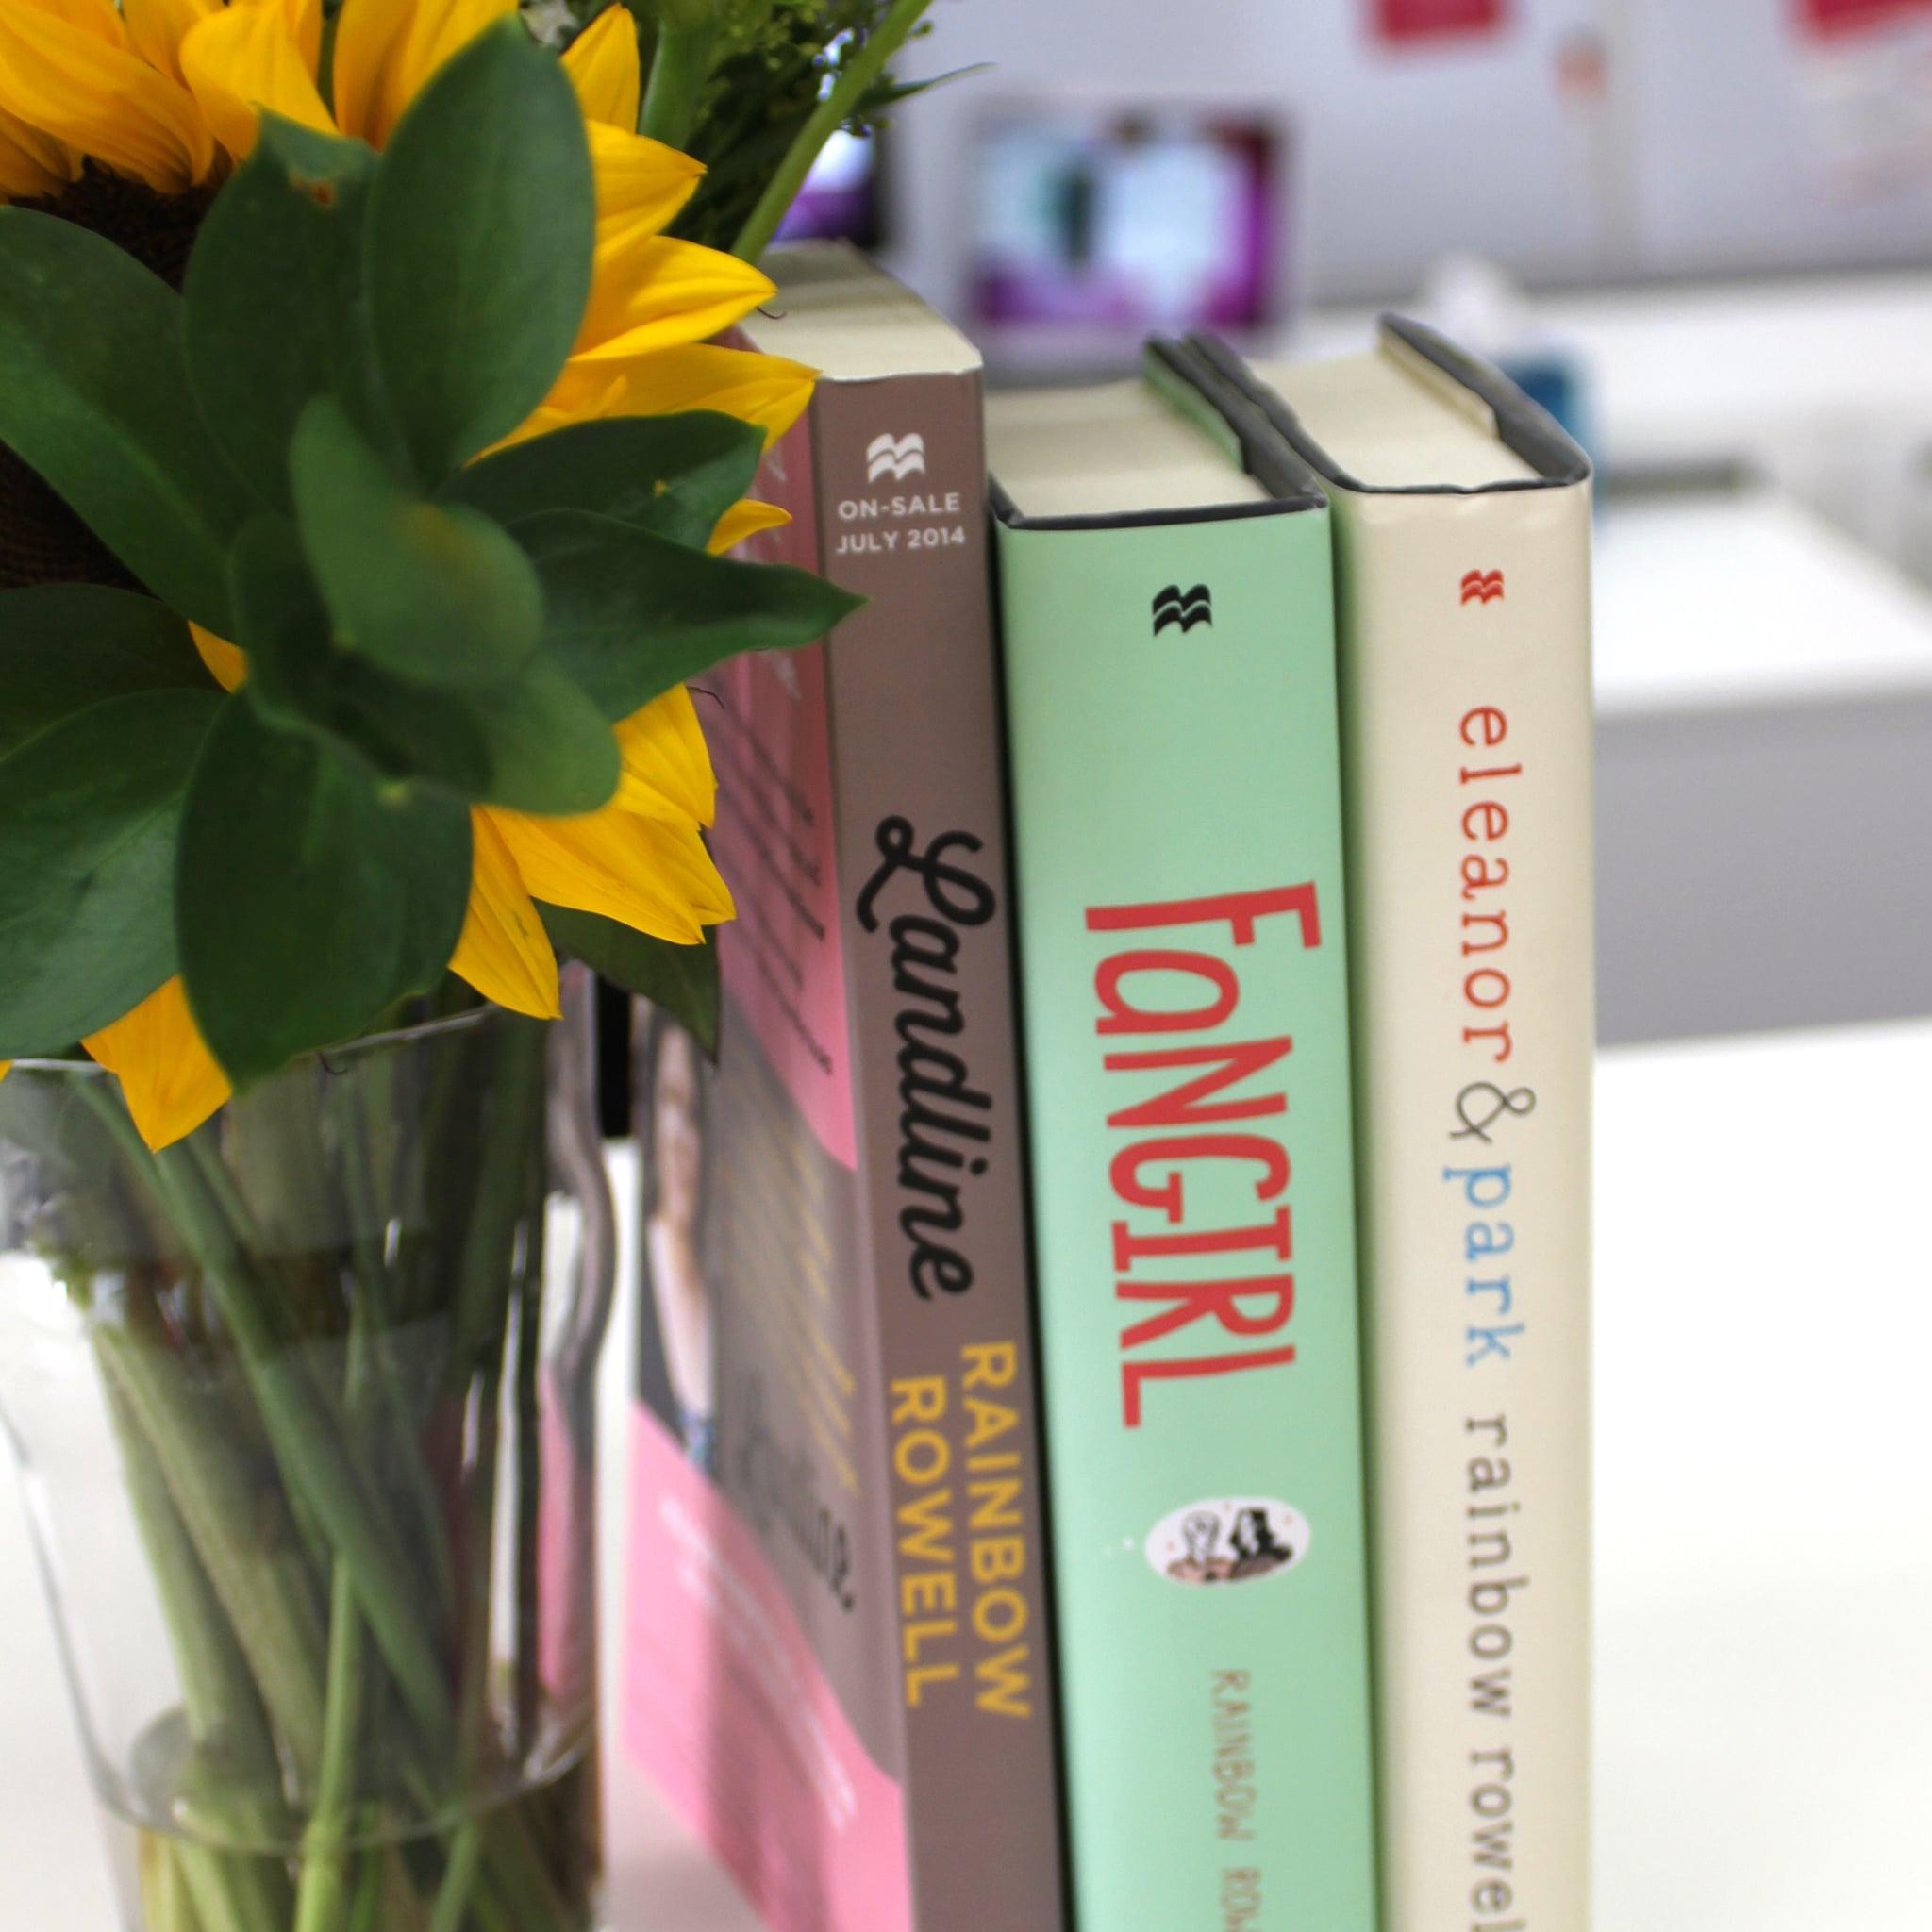 Resultado de imagen para rainbow rowell books